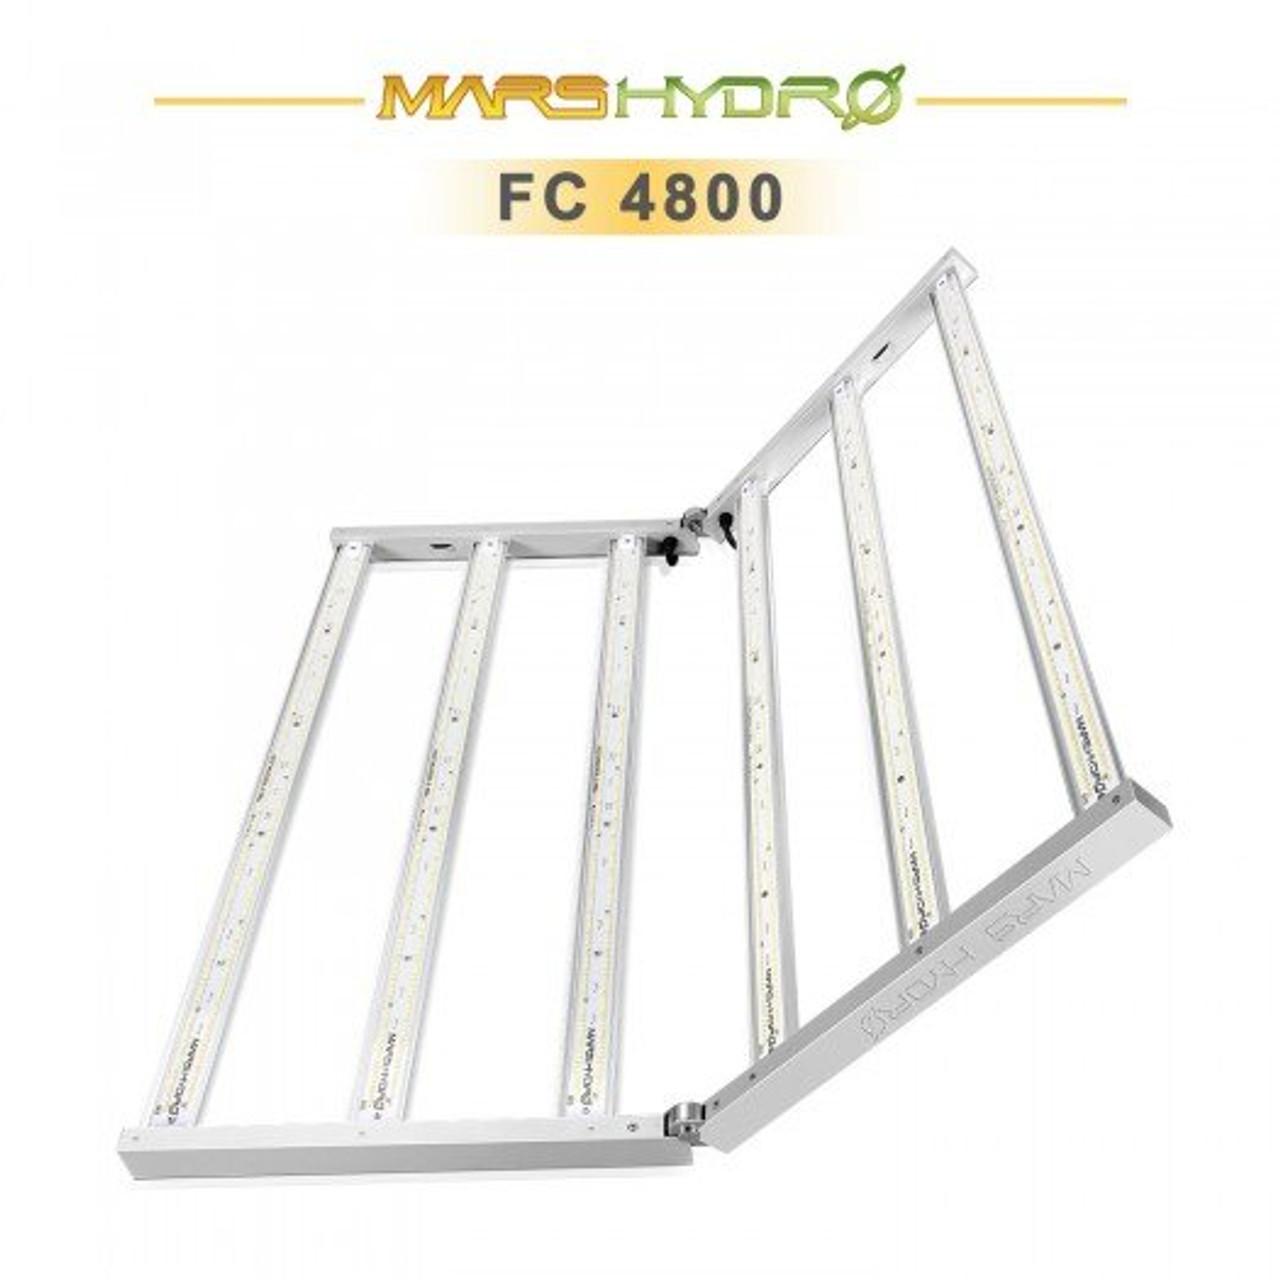 Mars FC 4800